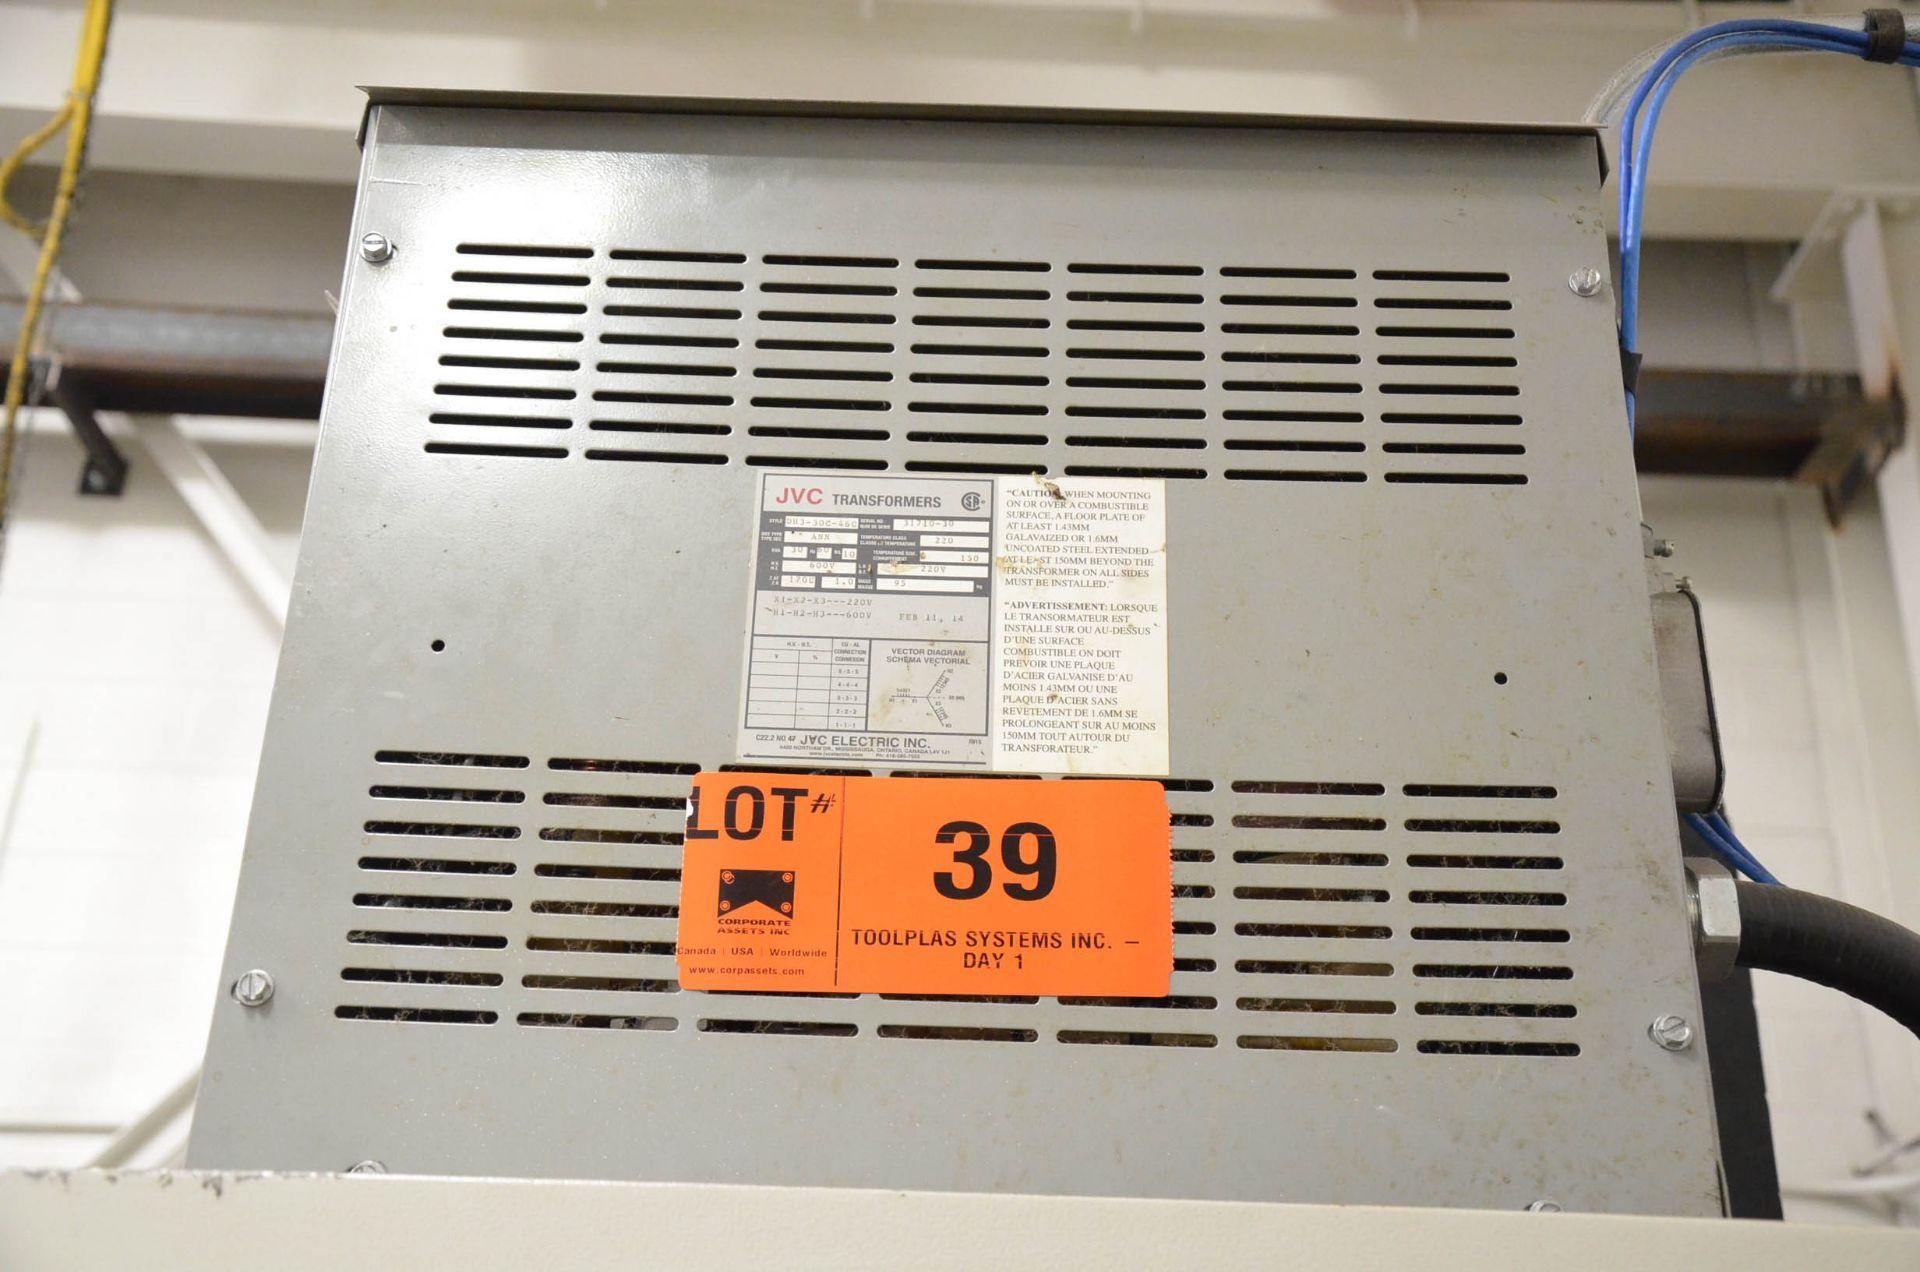 JVC 30KVA/600-220V/3PH/60HZ TRANSFORMER (CI) [RIGGING FEES FOR LOT #39 - $50 USD PLUS APPLICABLE